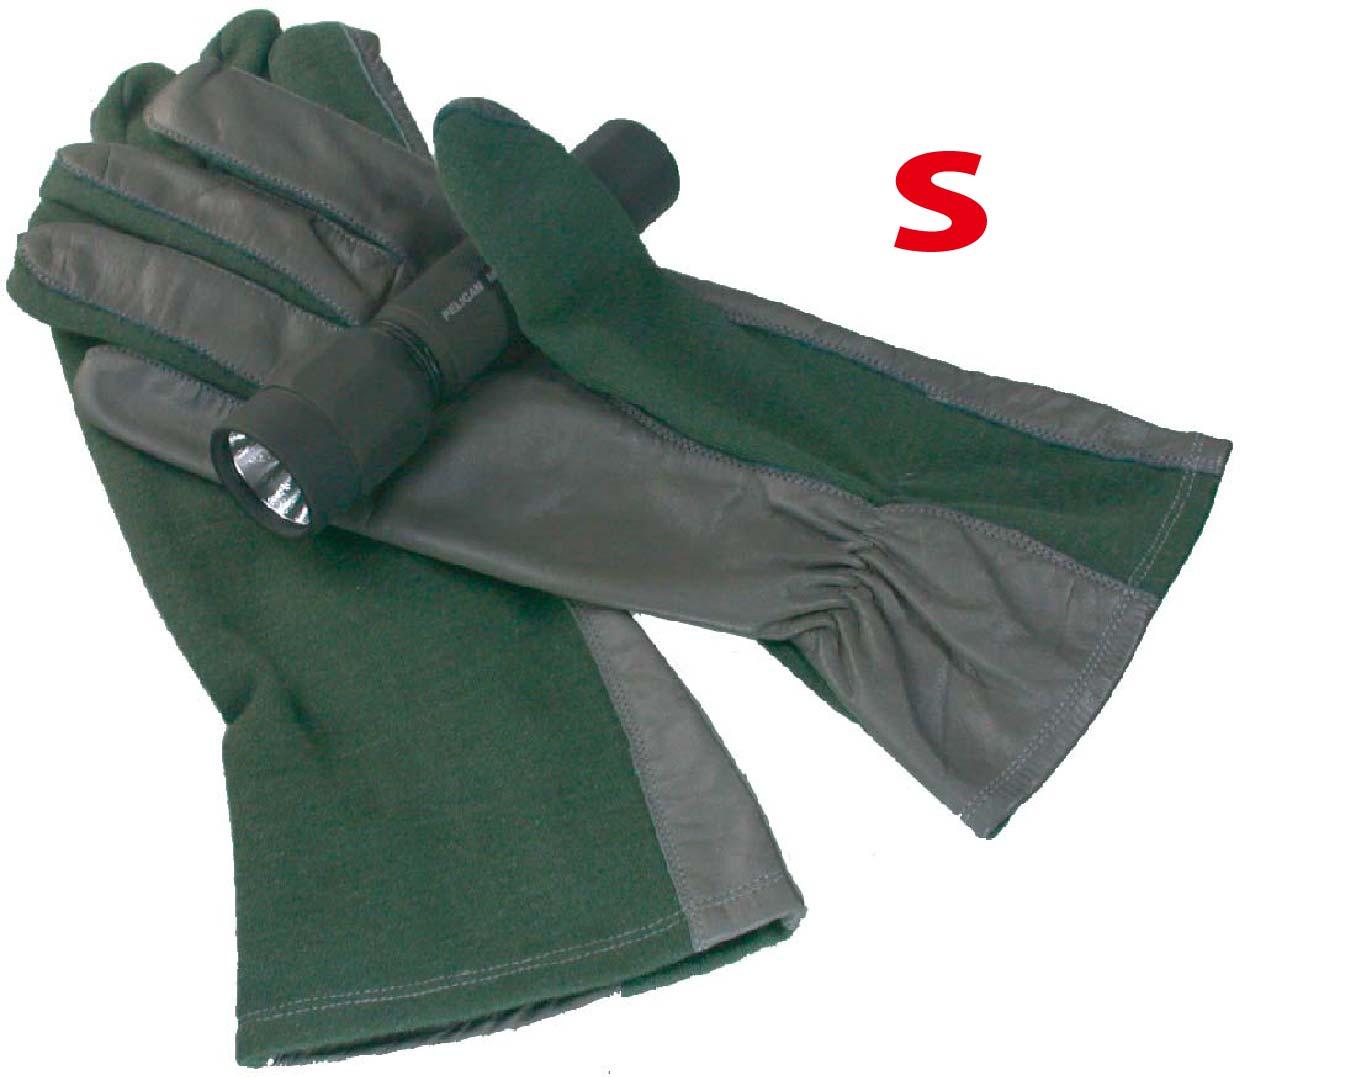 MIL-FORCE ミルフォース ノーメックス/本革 パイロットグラブ  手袋 オリーブ Sサイズ PG-05P-OD-S